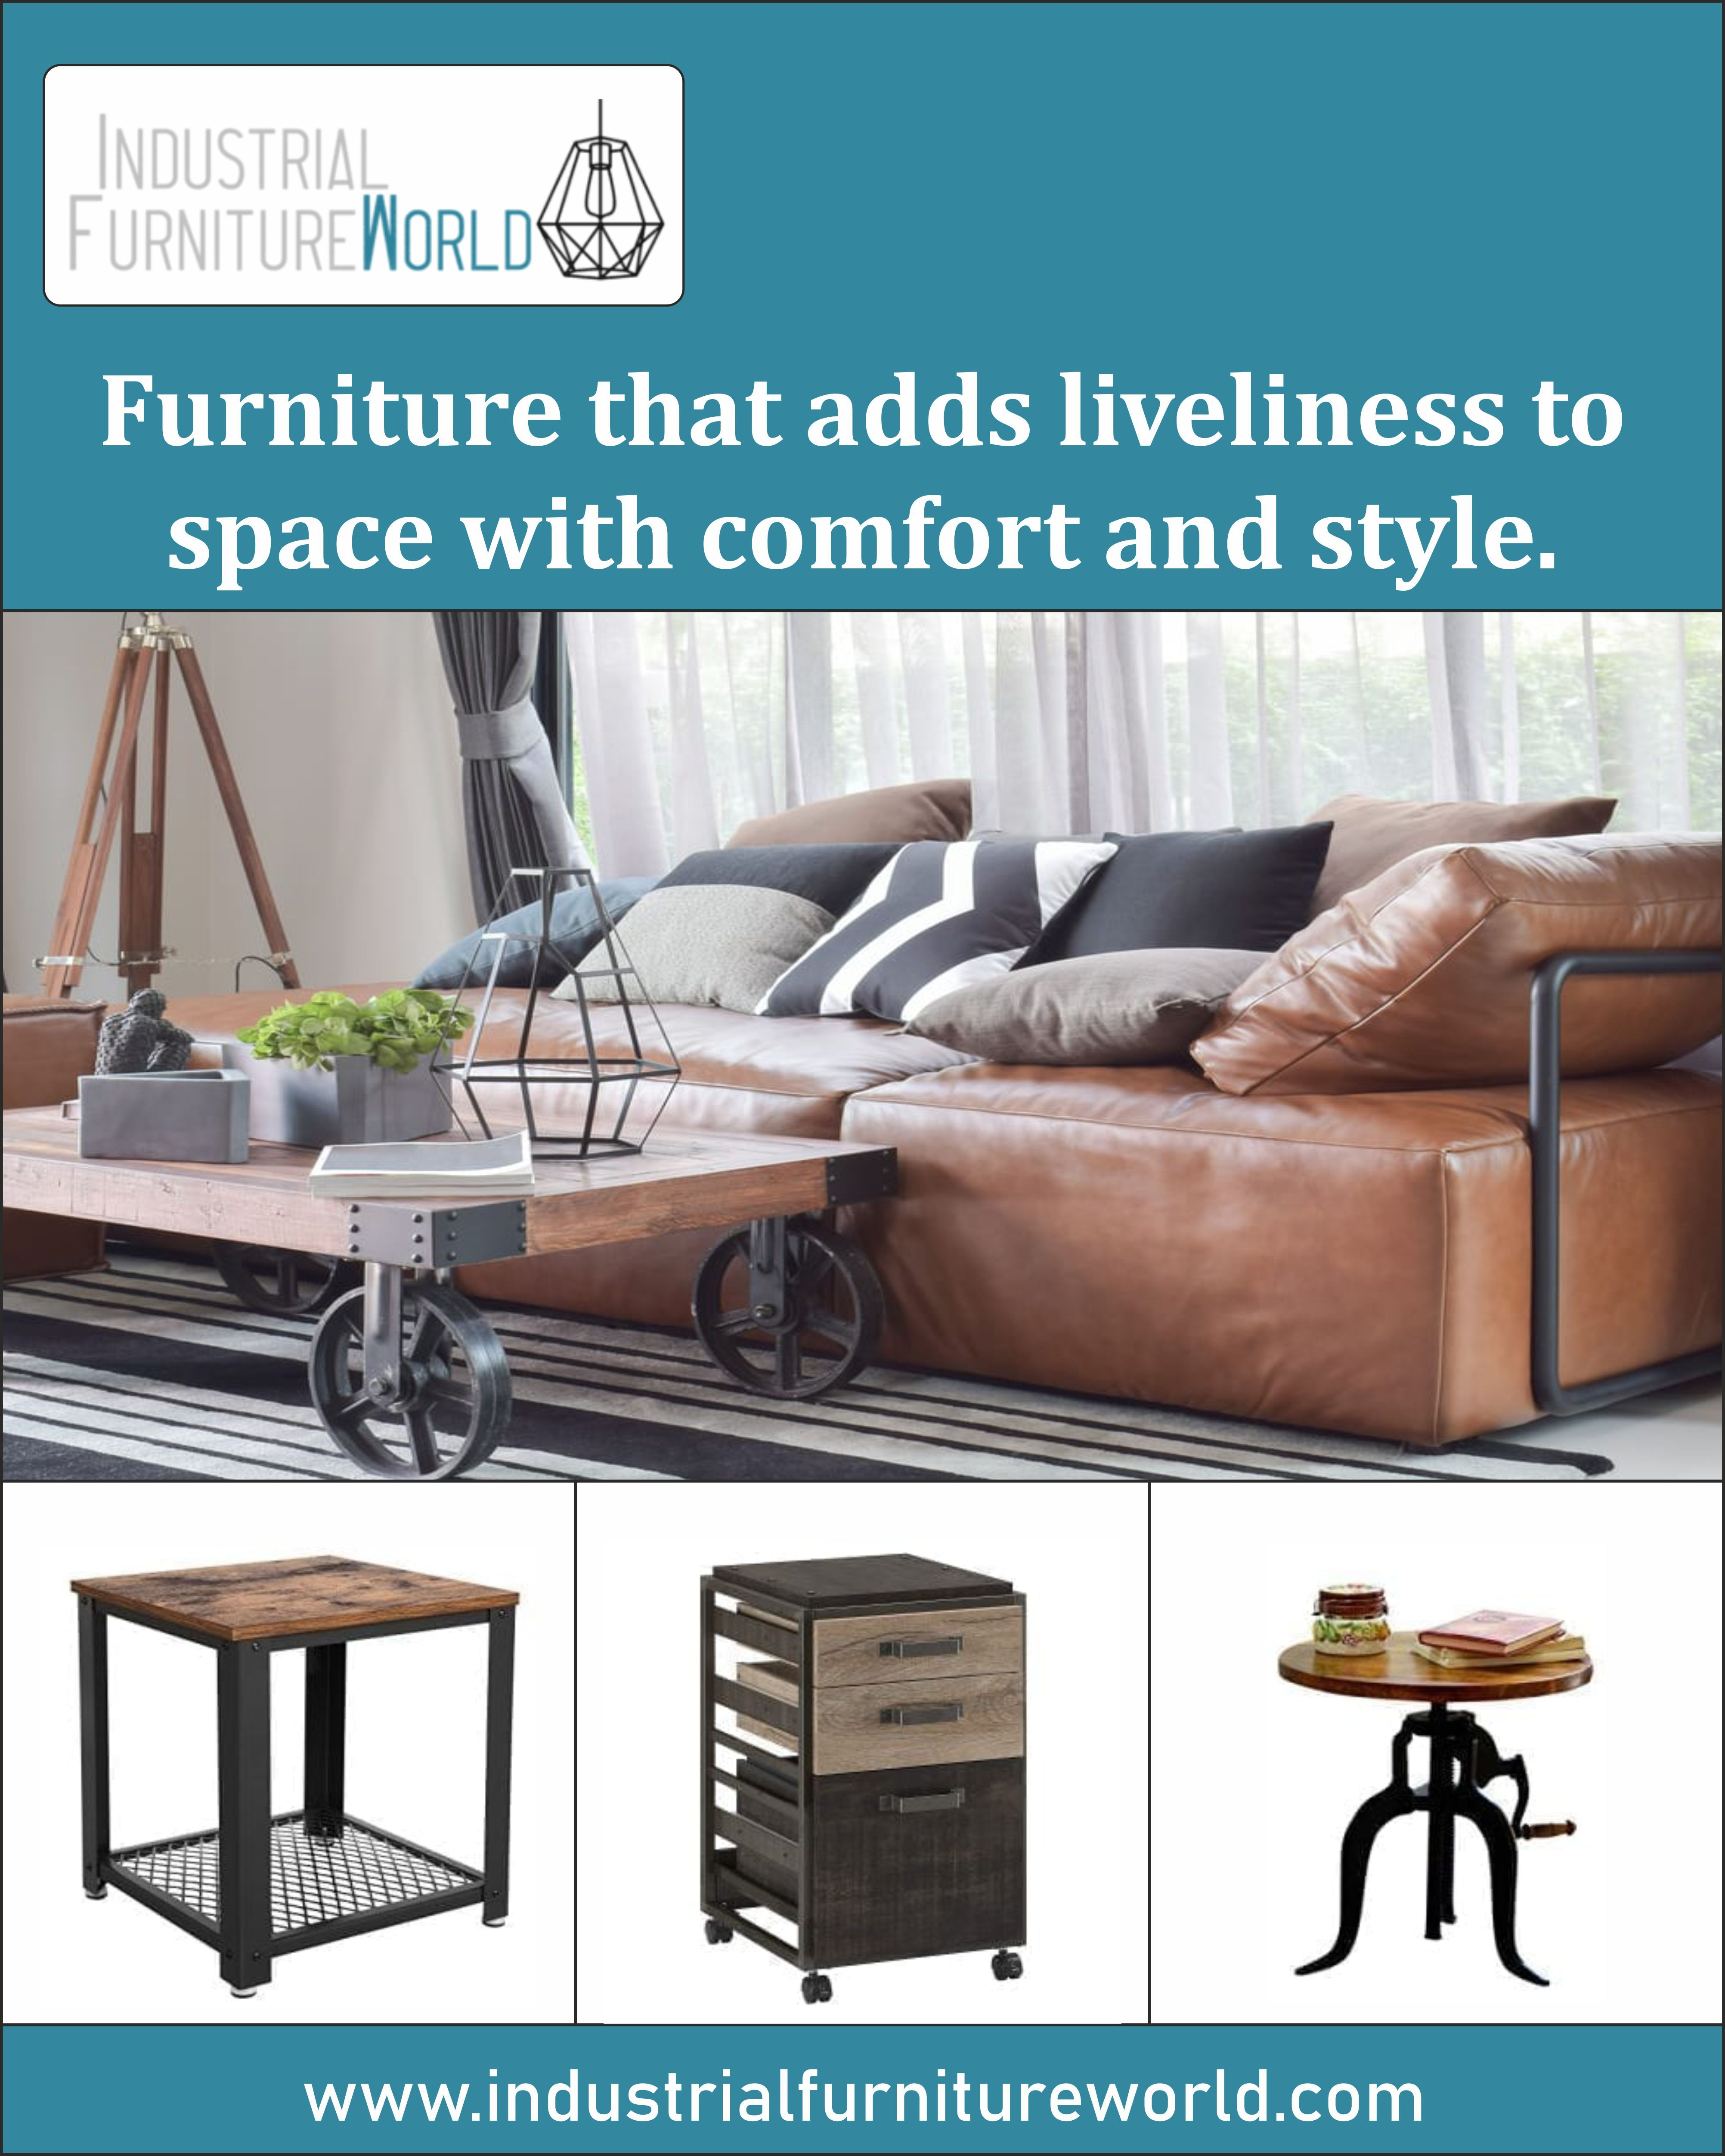 Furniture that adds liveliness to space with comfort and style. #furniture #furniturejepara #furniturejeparamurah #almarihias #ikea #ikeaindonesia #ikeaonlineindonesia #CasaInteriorDesign #interiordesign